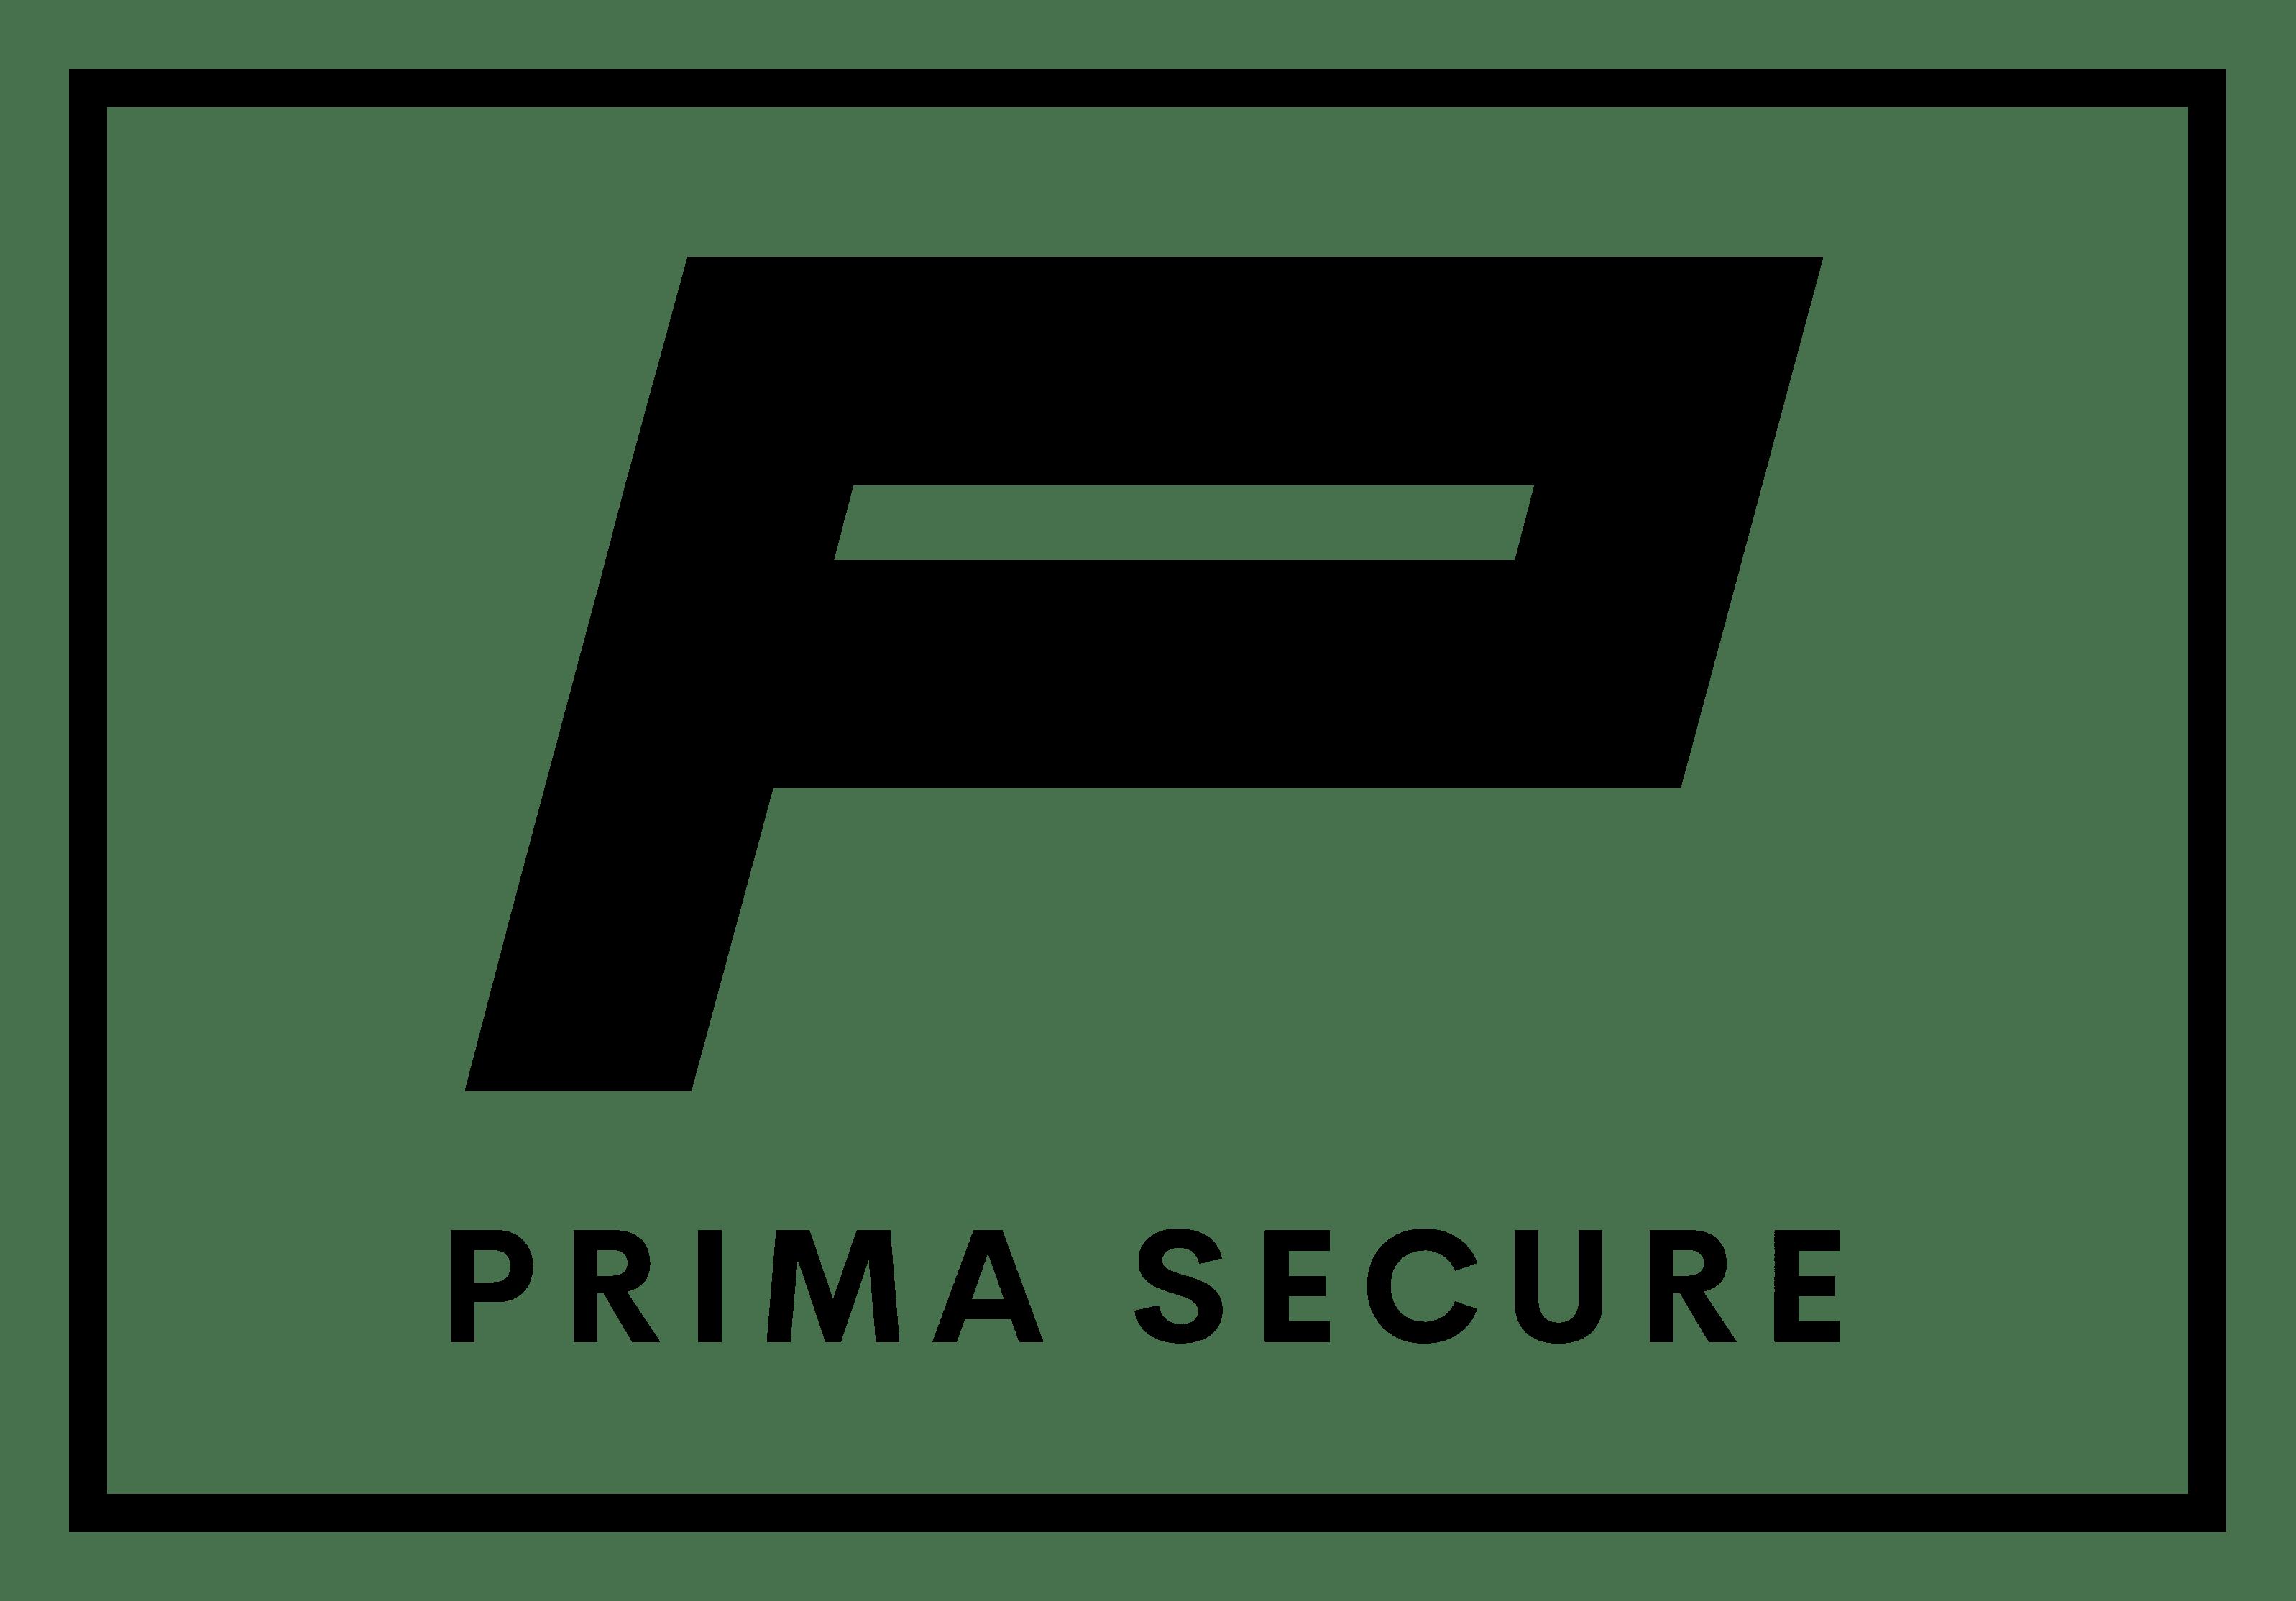 Prima Secure